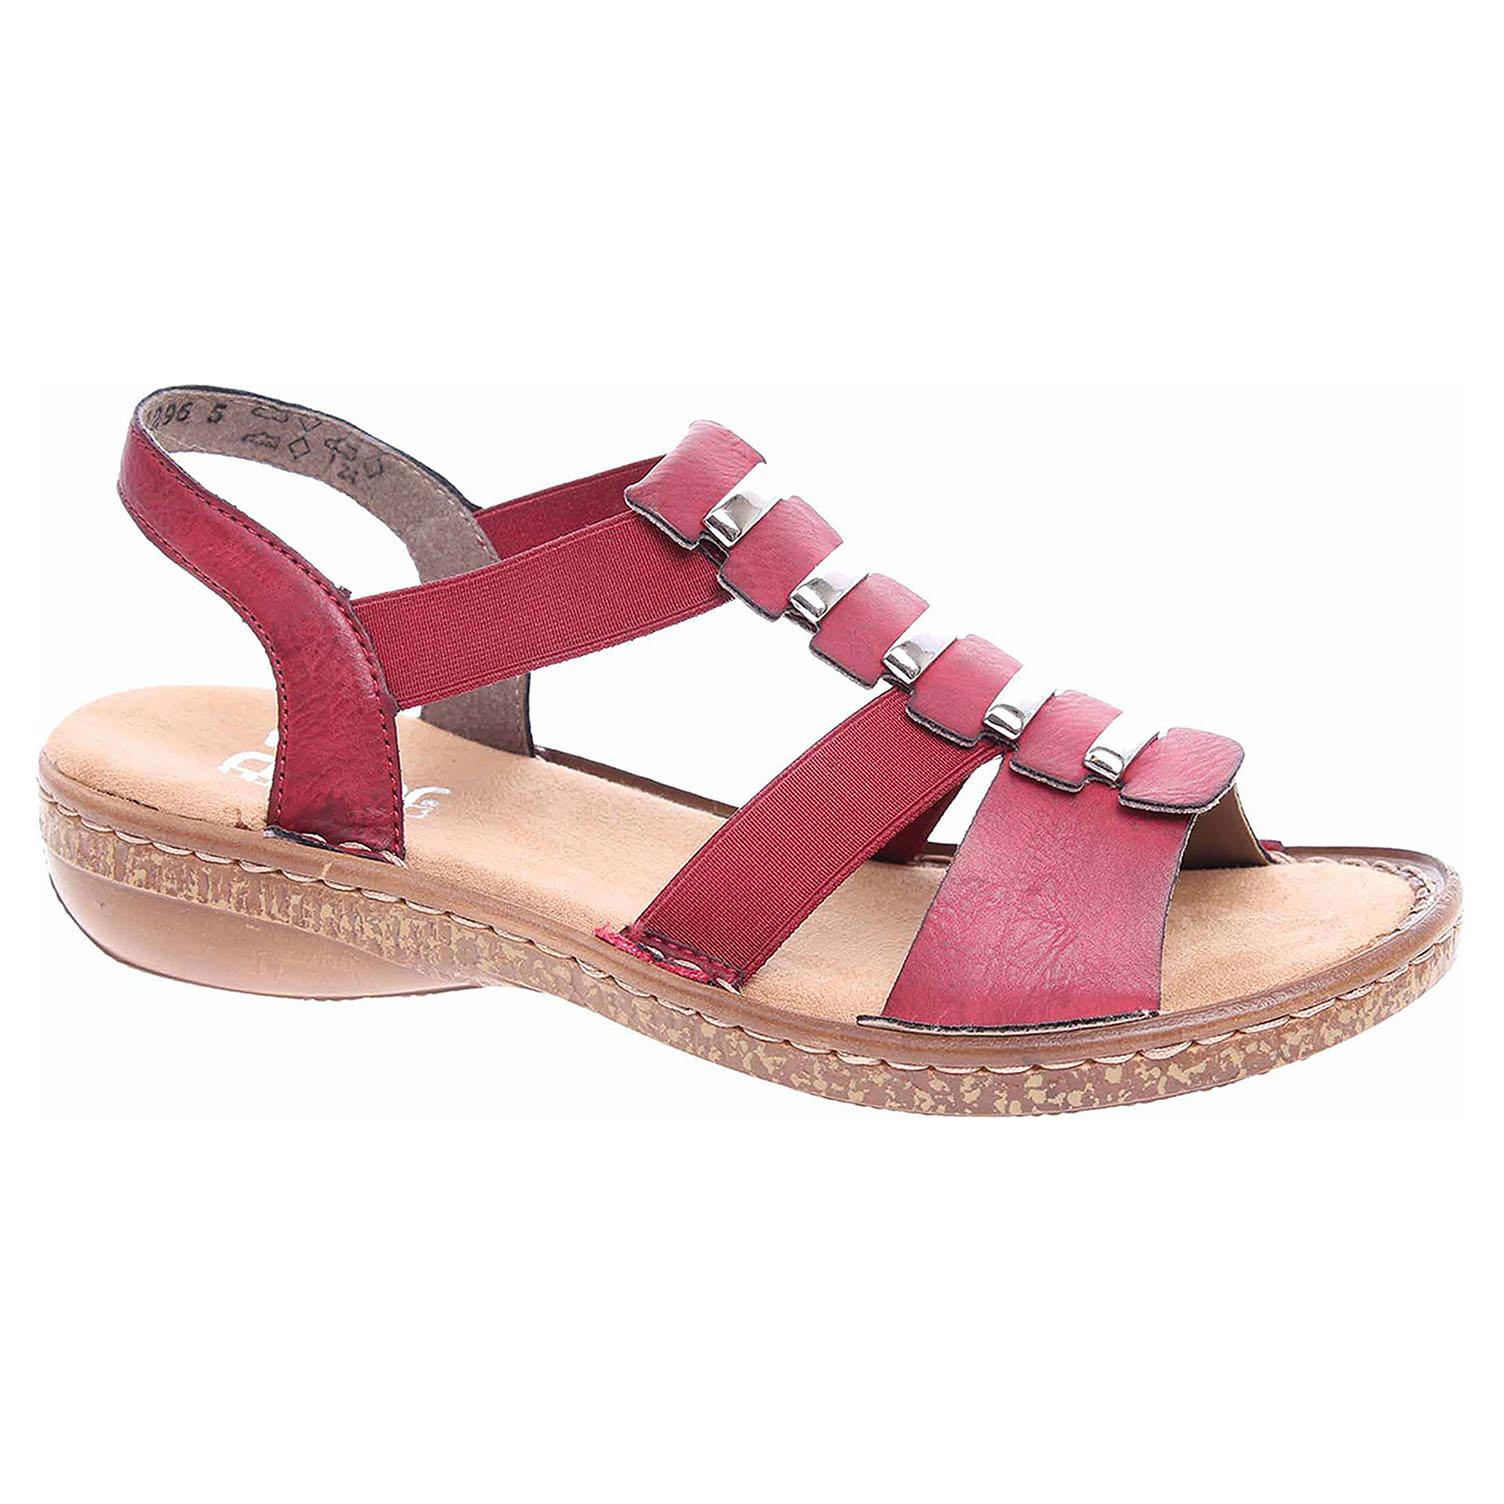 0faf67d13ef1 detail Dámske sandále Rieker 62850-35 rot